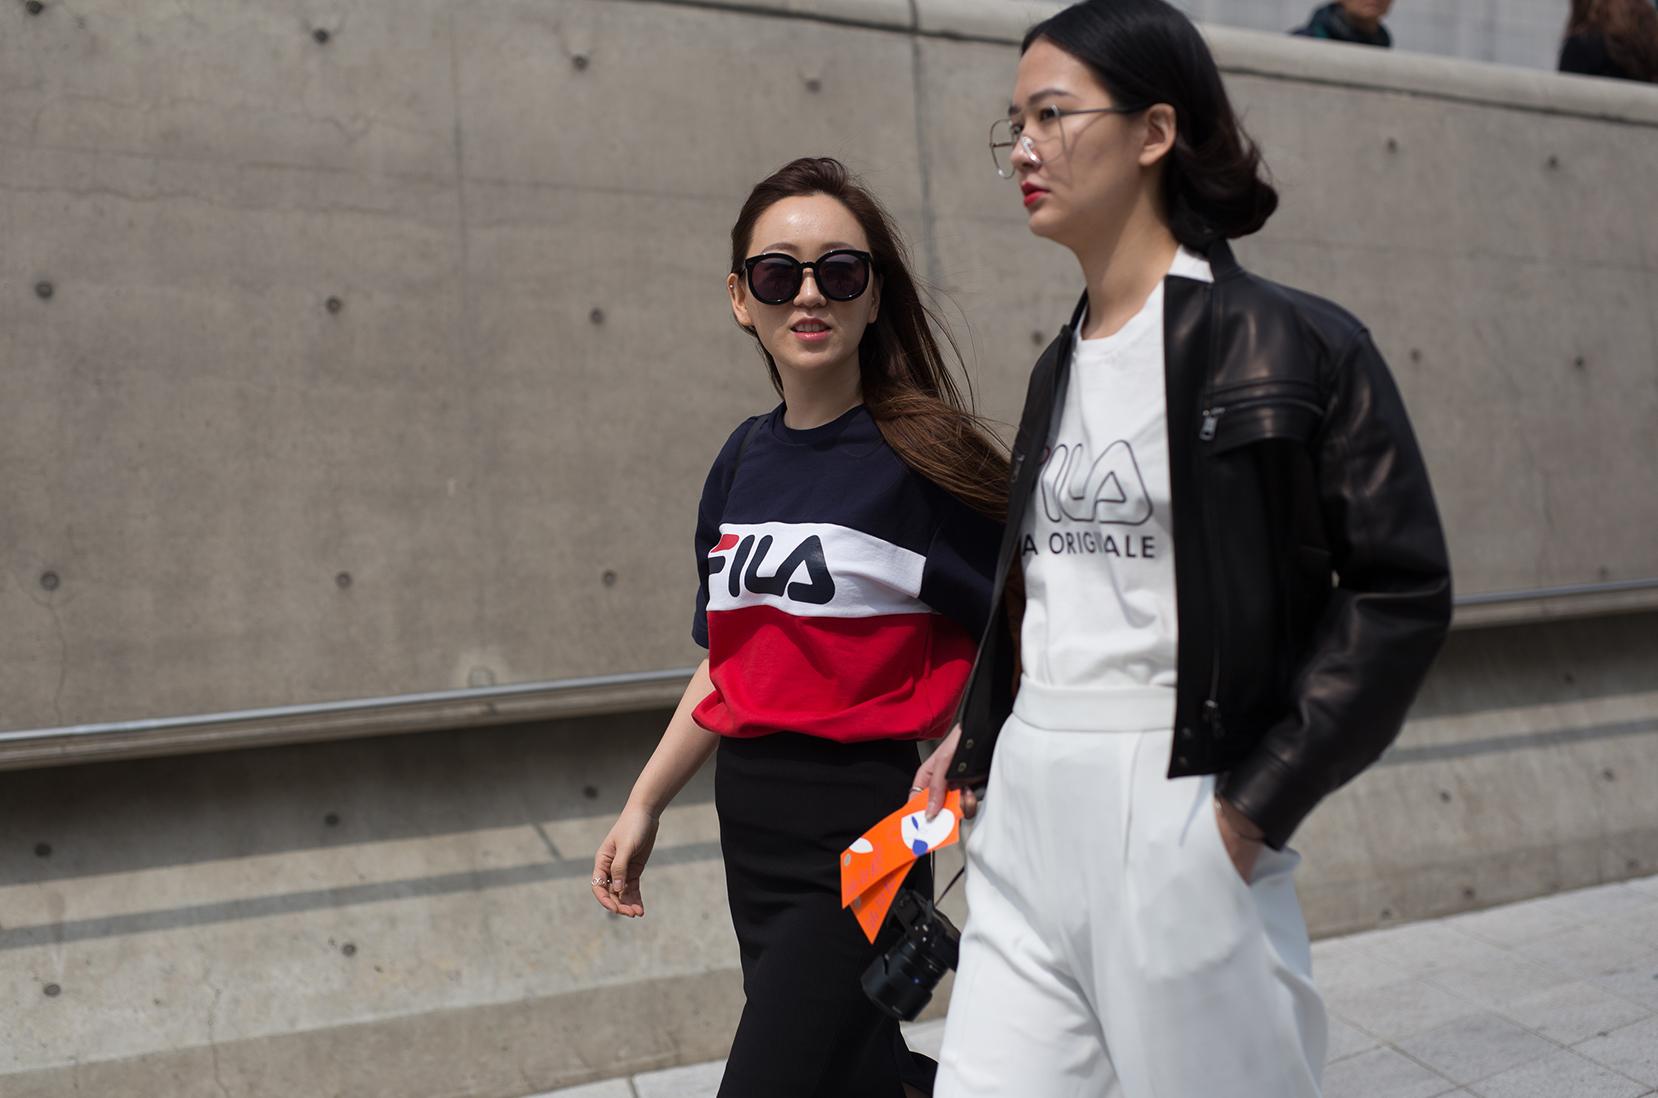 b6acb91e832c Street Style Seoul © Matthew Sperzel/Getty Images